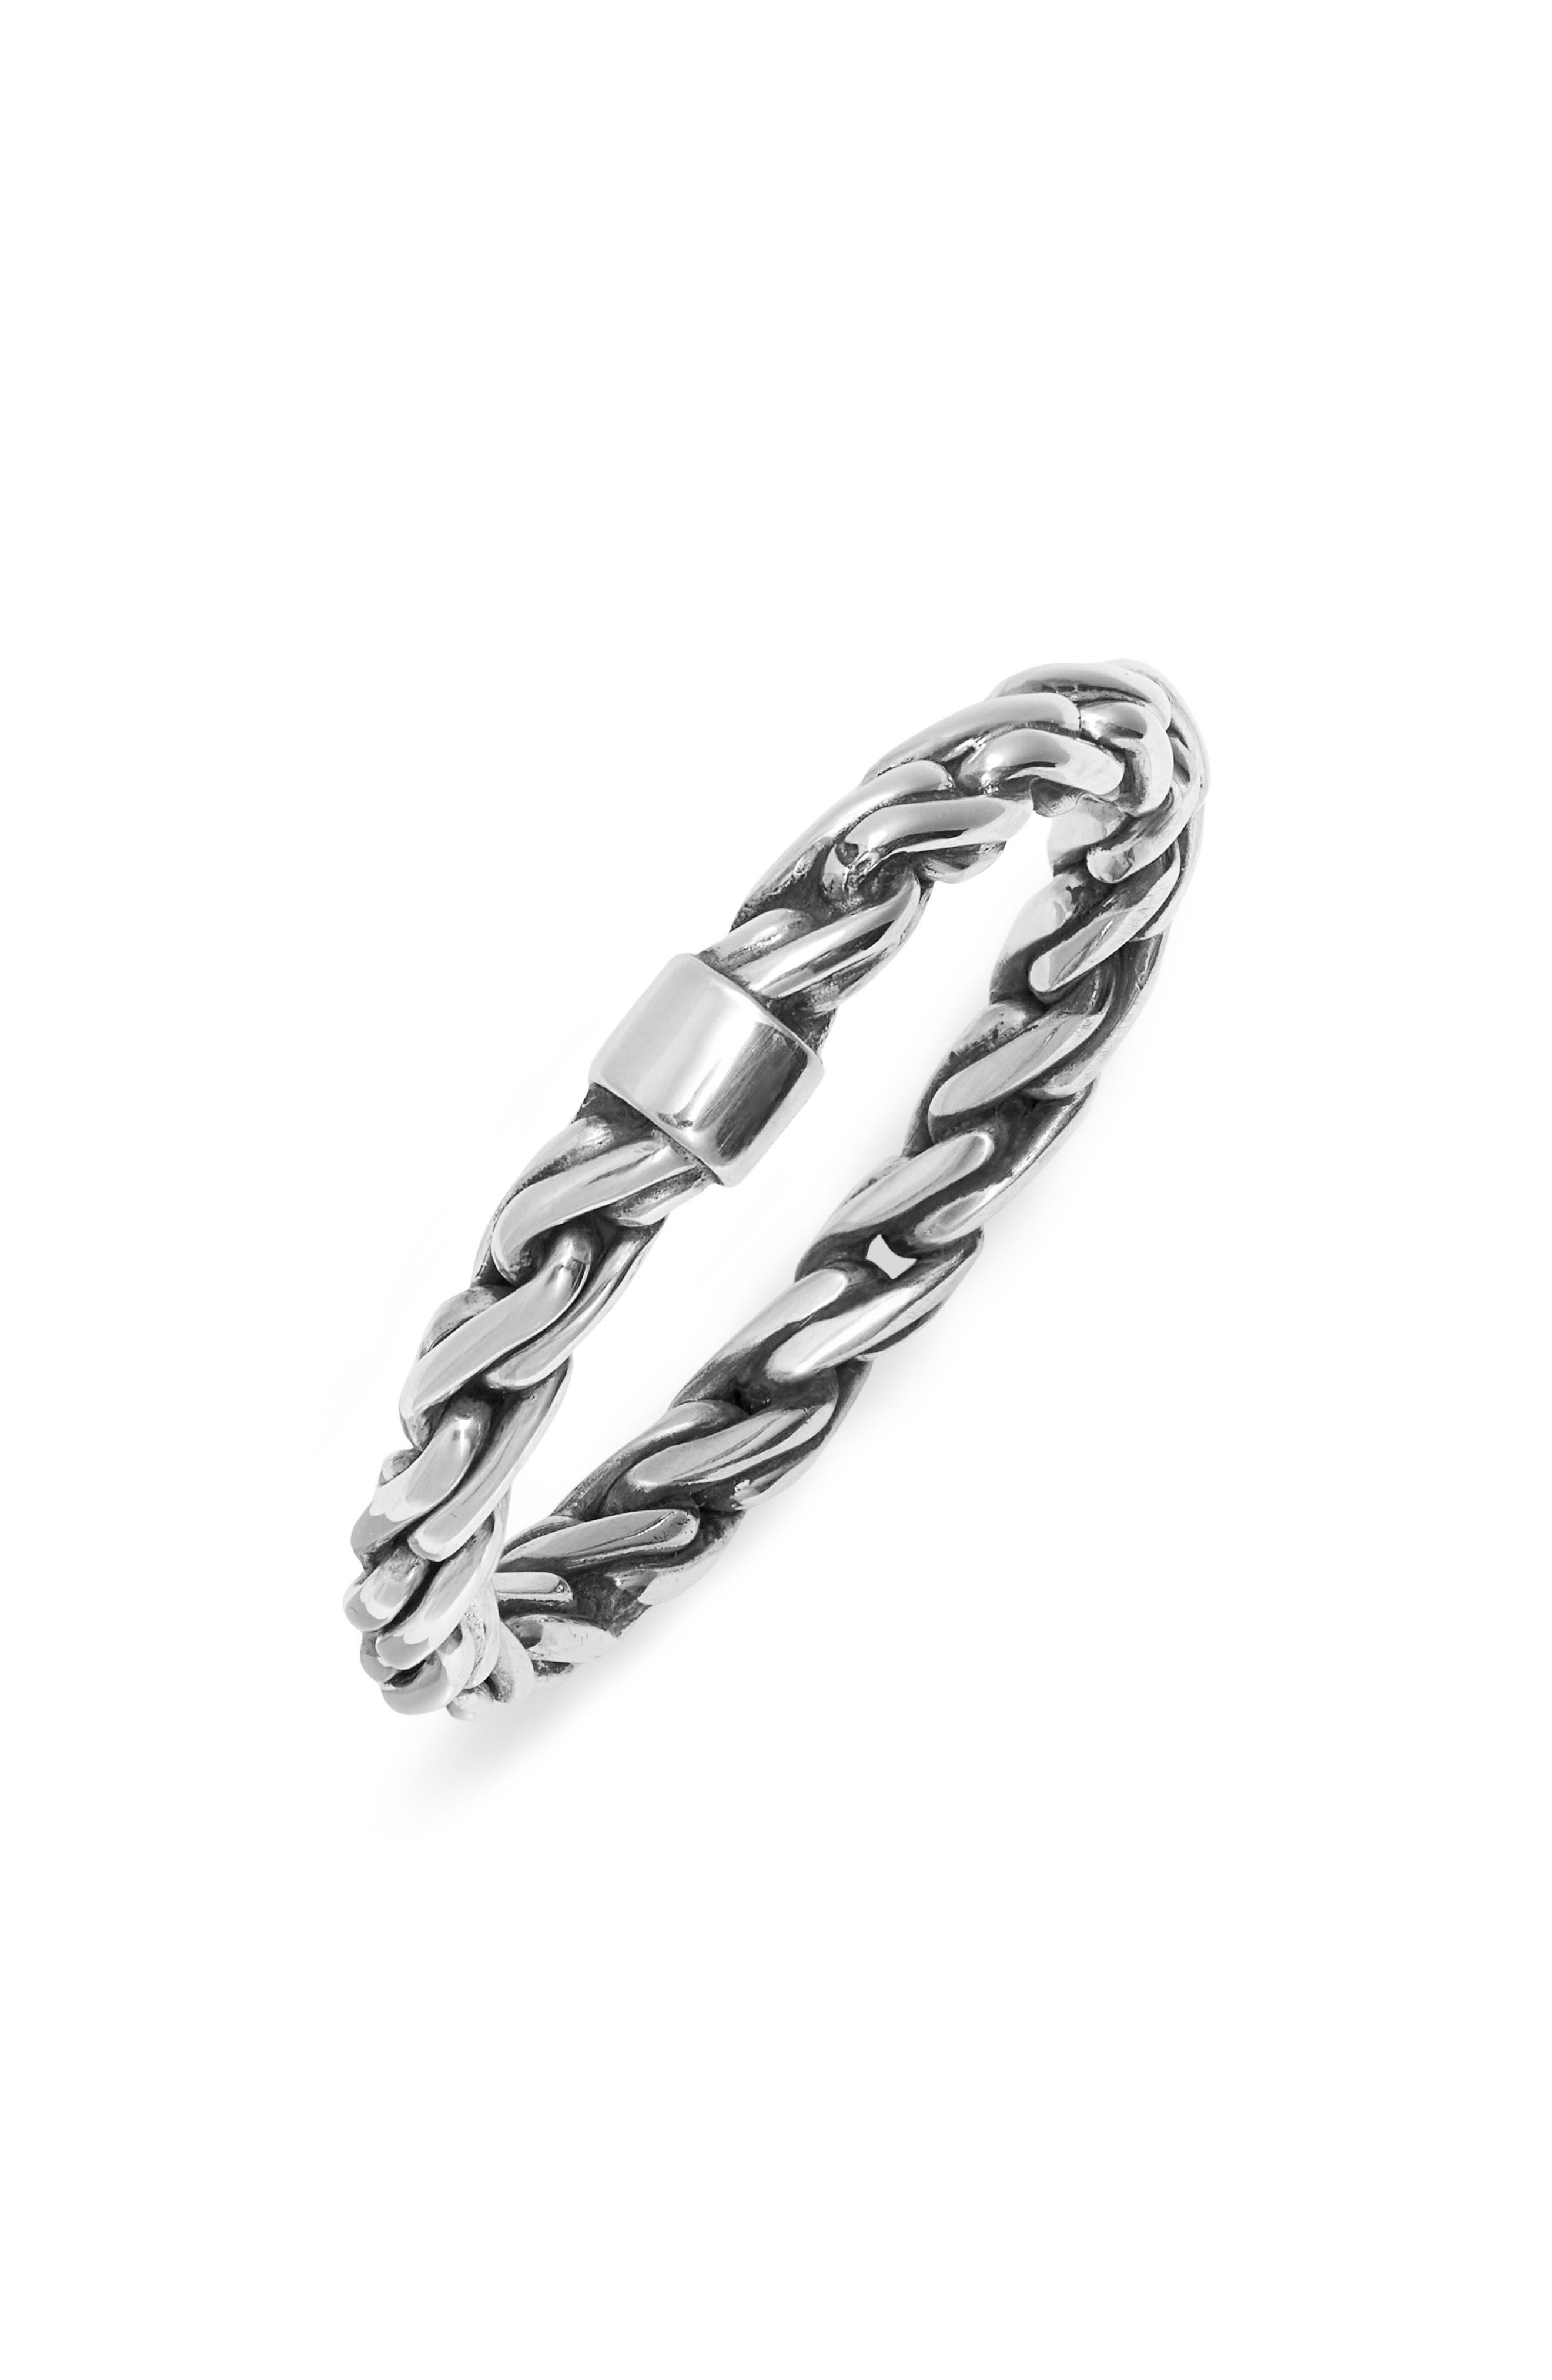 Men's Rope Chain Ring